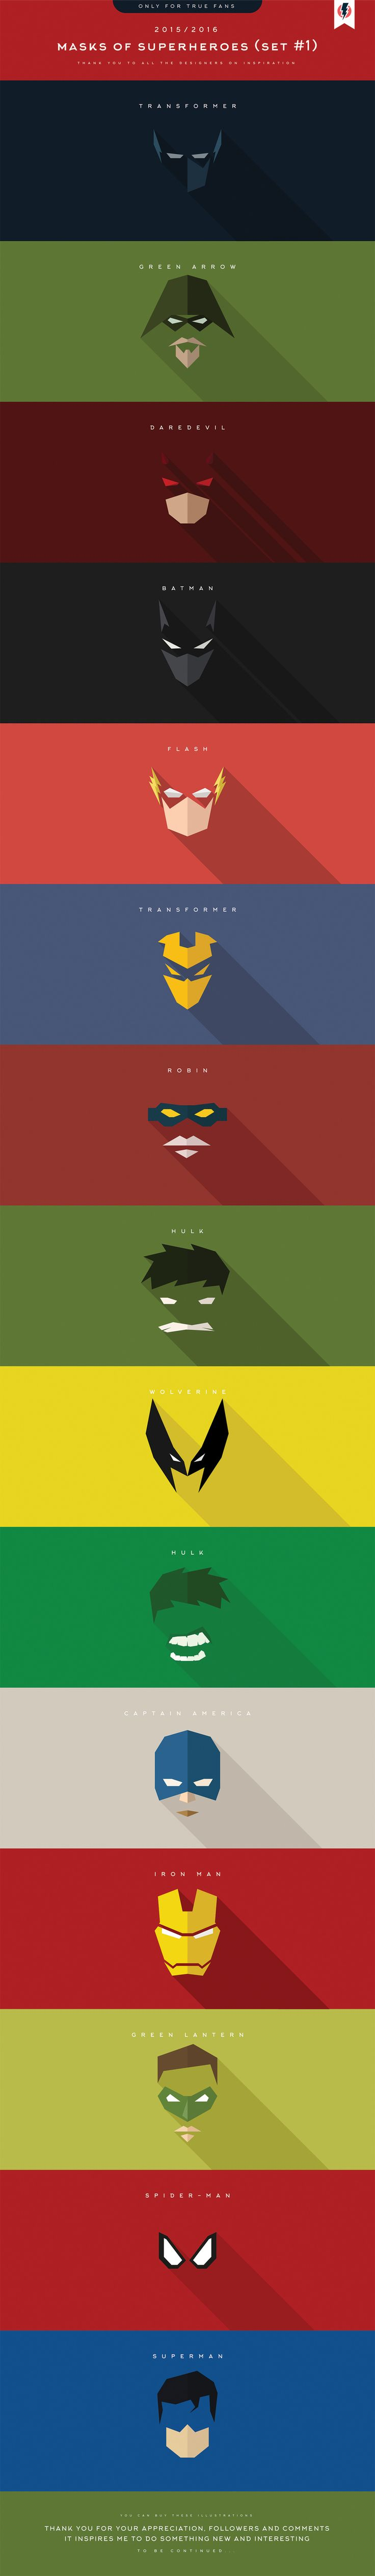 Minimalist Superhero Masks For Batman, Daredevil, Deadpool, and More